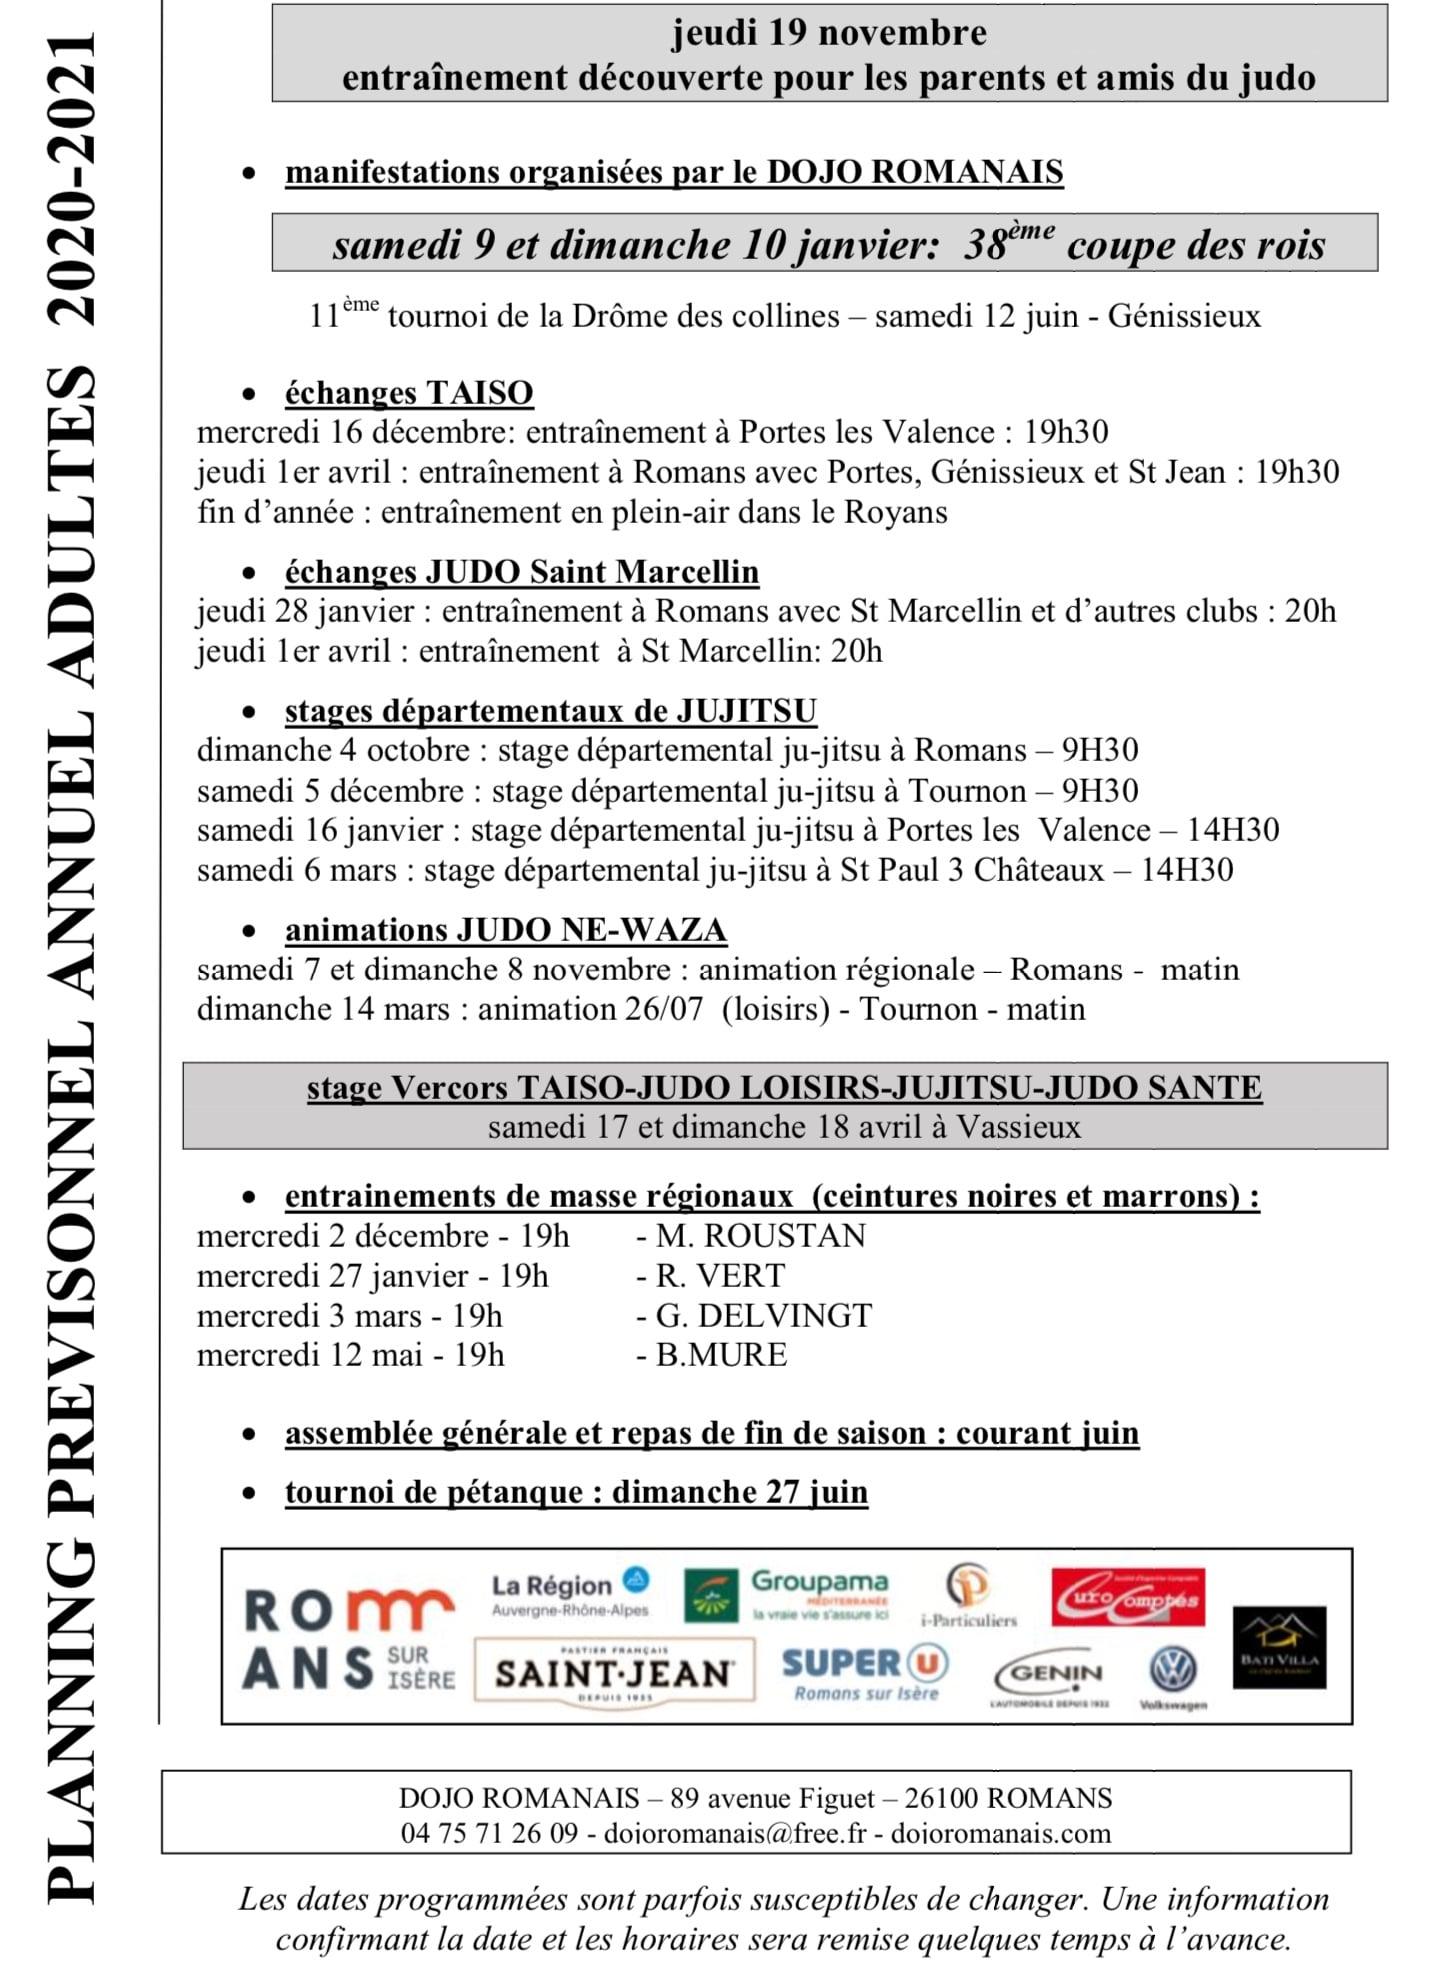 Calendrier Judo 2021 Planning loisirs 2020 / 2021 – Dojo Romanais